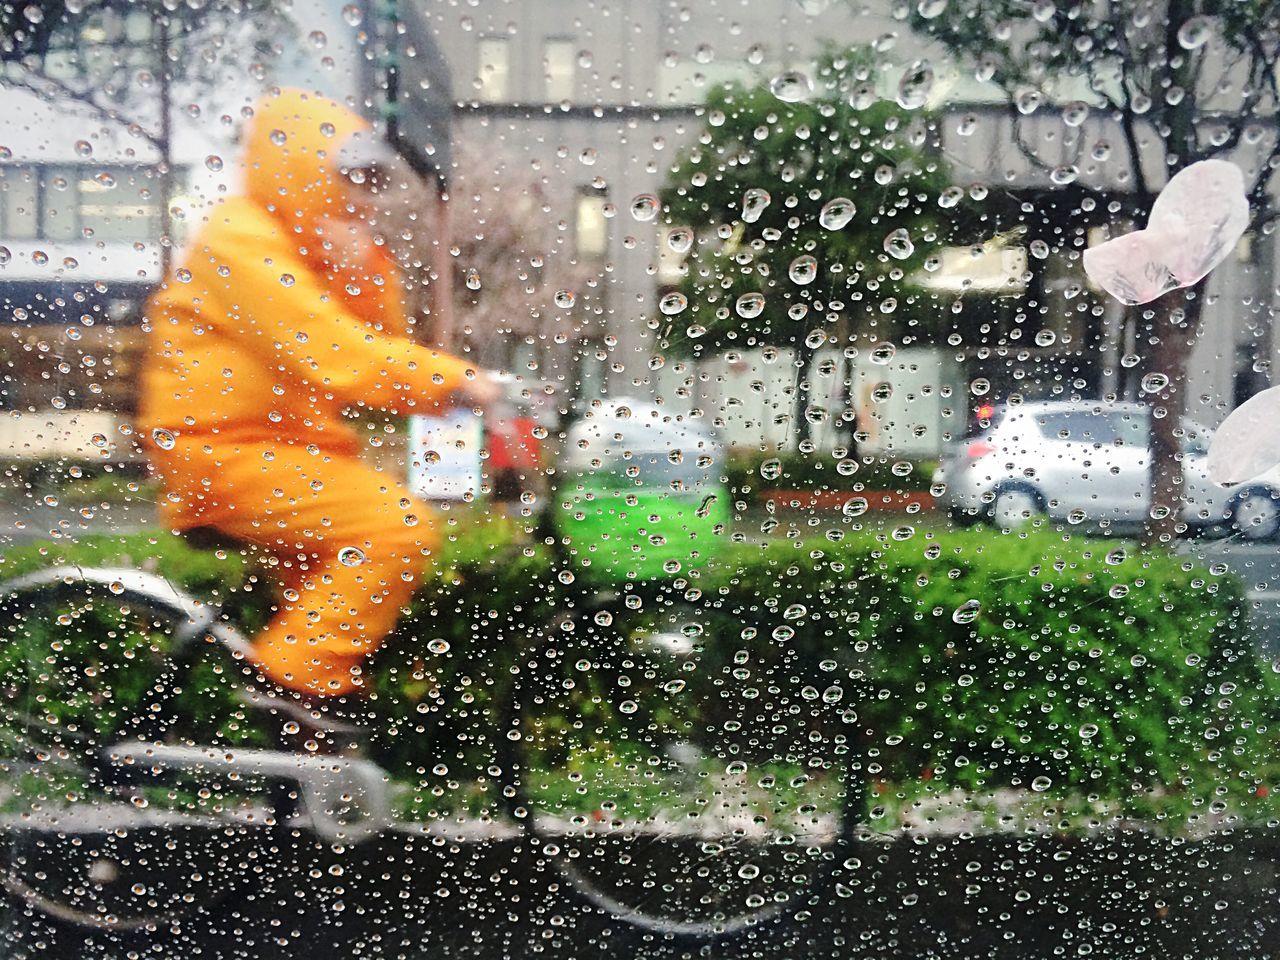 Open Edit Streetphotography Water_collection EyeEm Best Edits Shootermag_japan Taking Photos EyeEm Best Shots Rain Raindrops Orange By Motorola